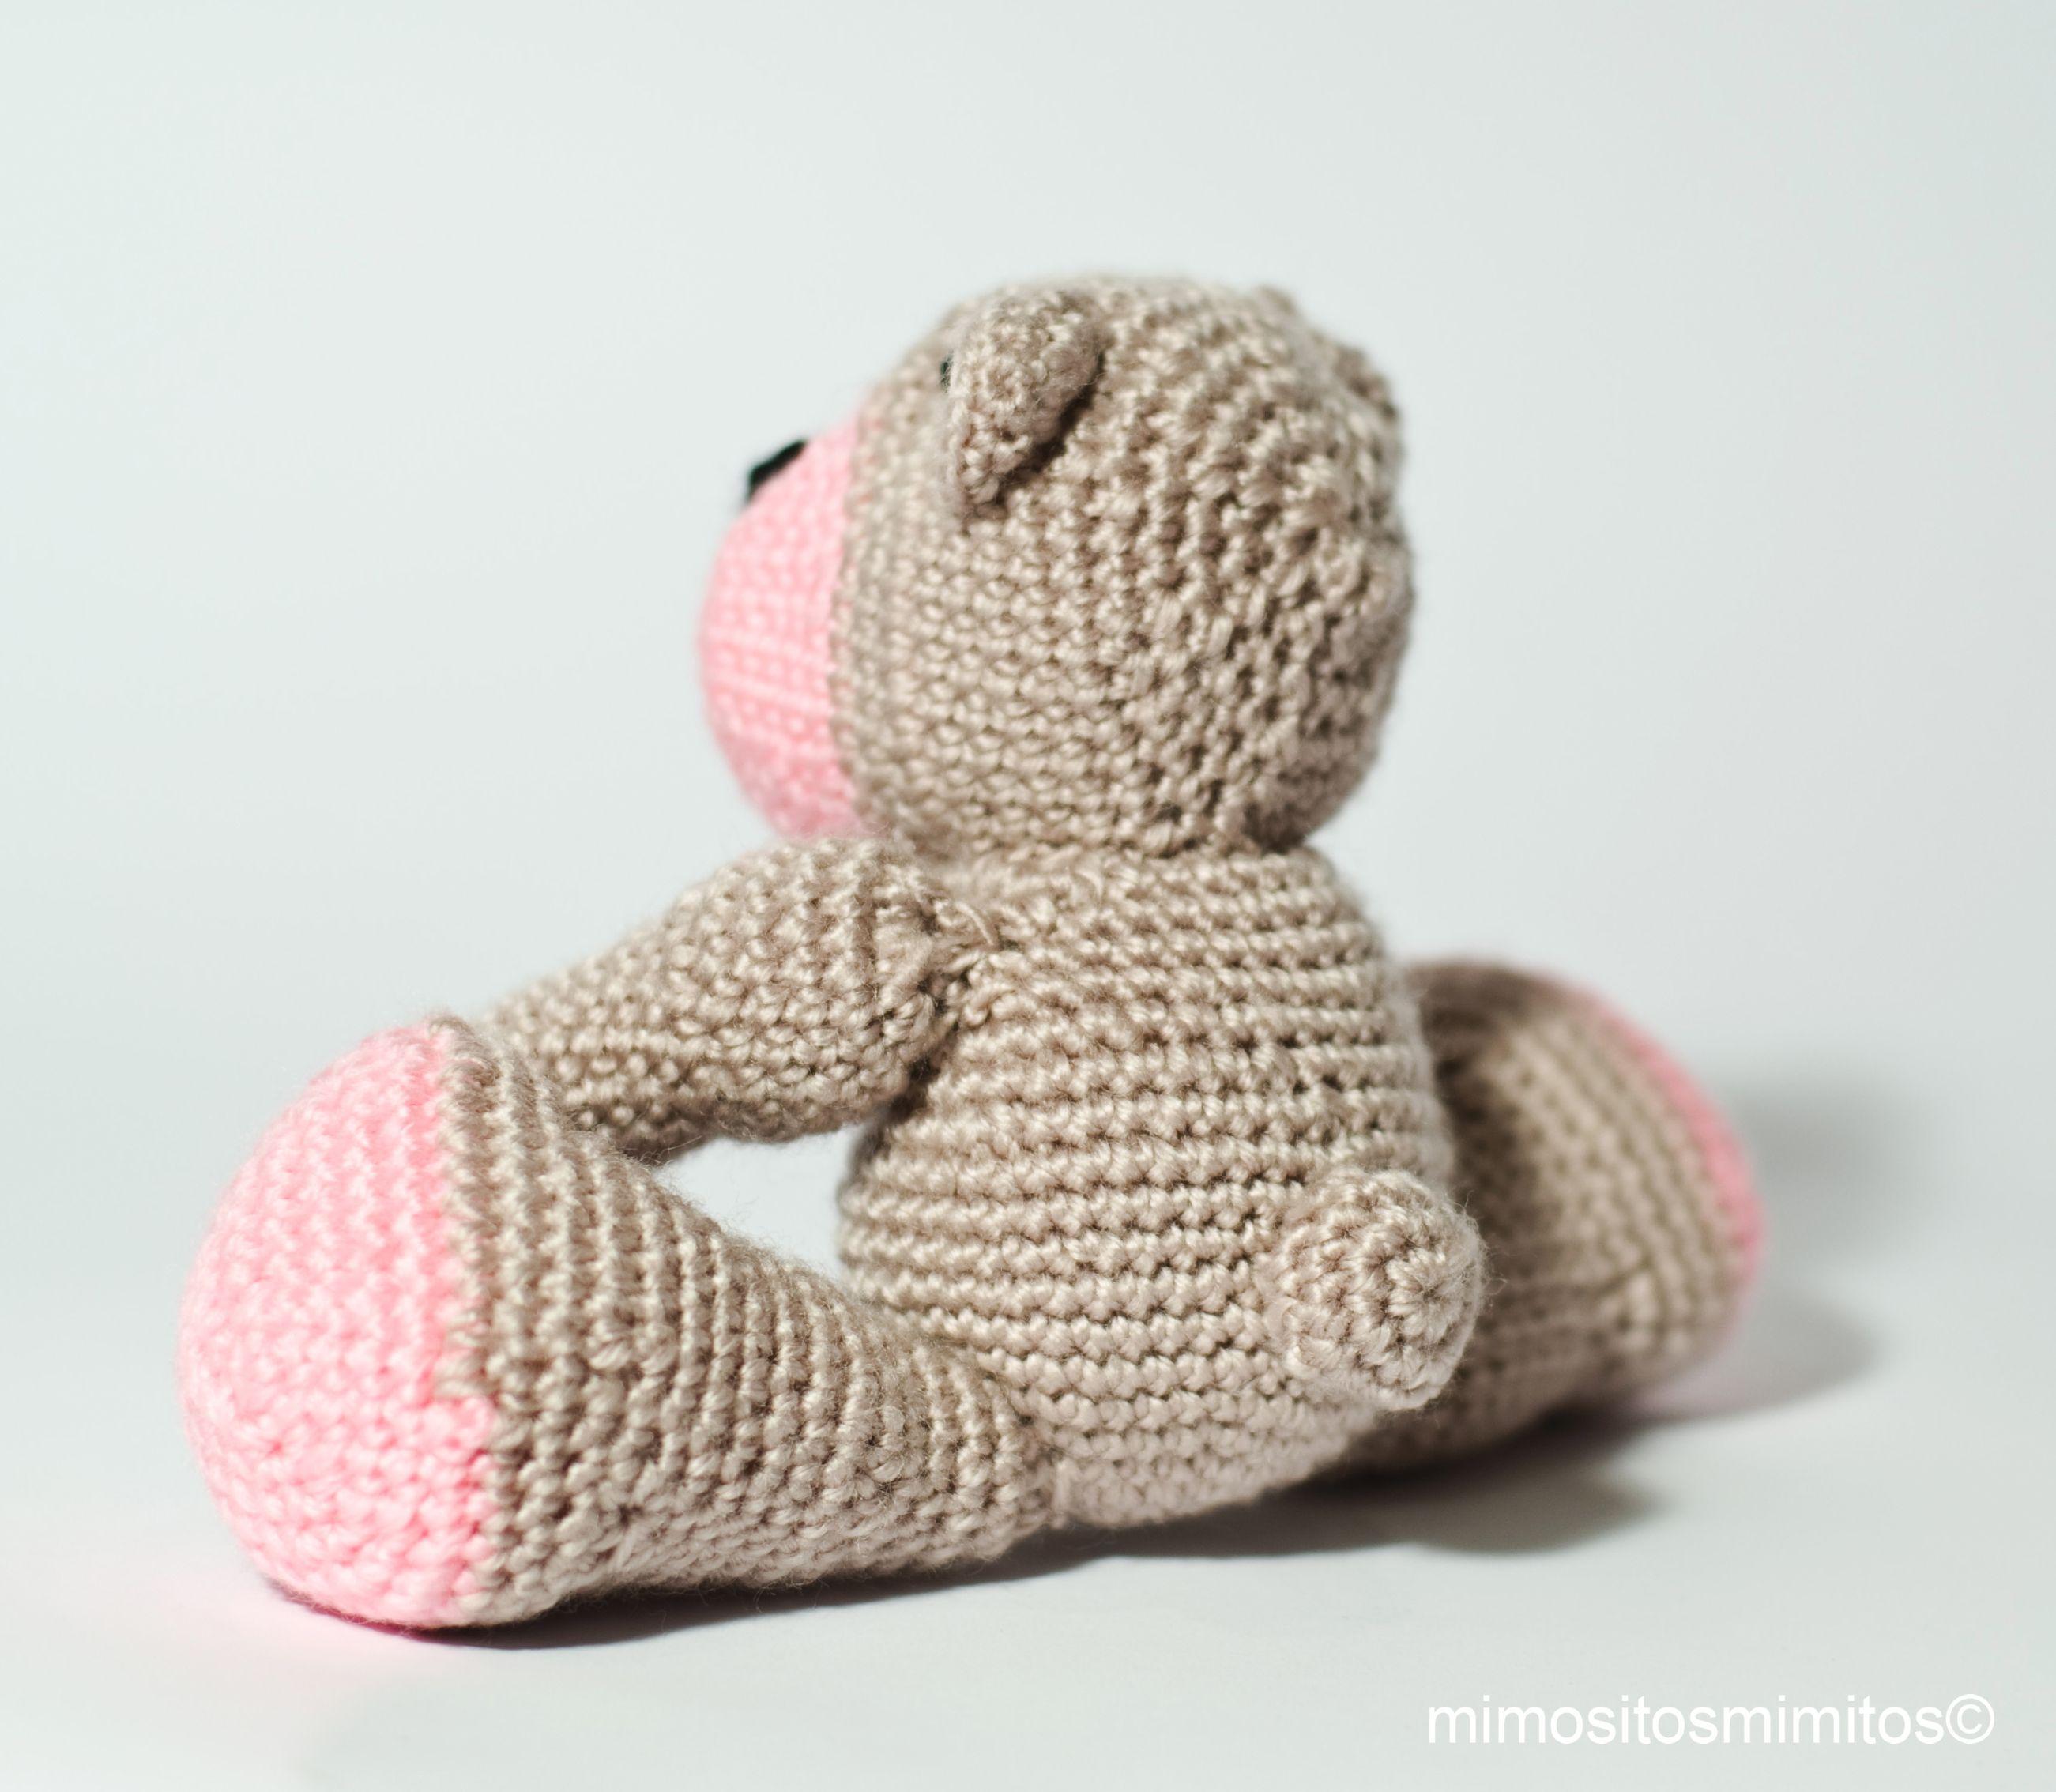 oso osito amigurumi lana ganchillo crochet marrón rosa bear ugly ...